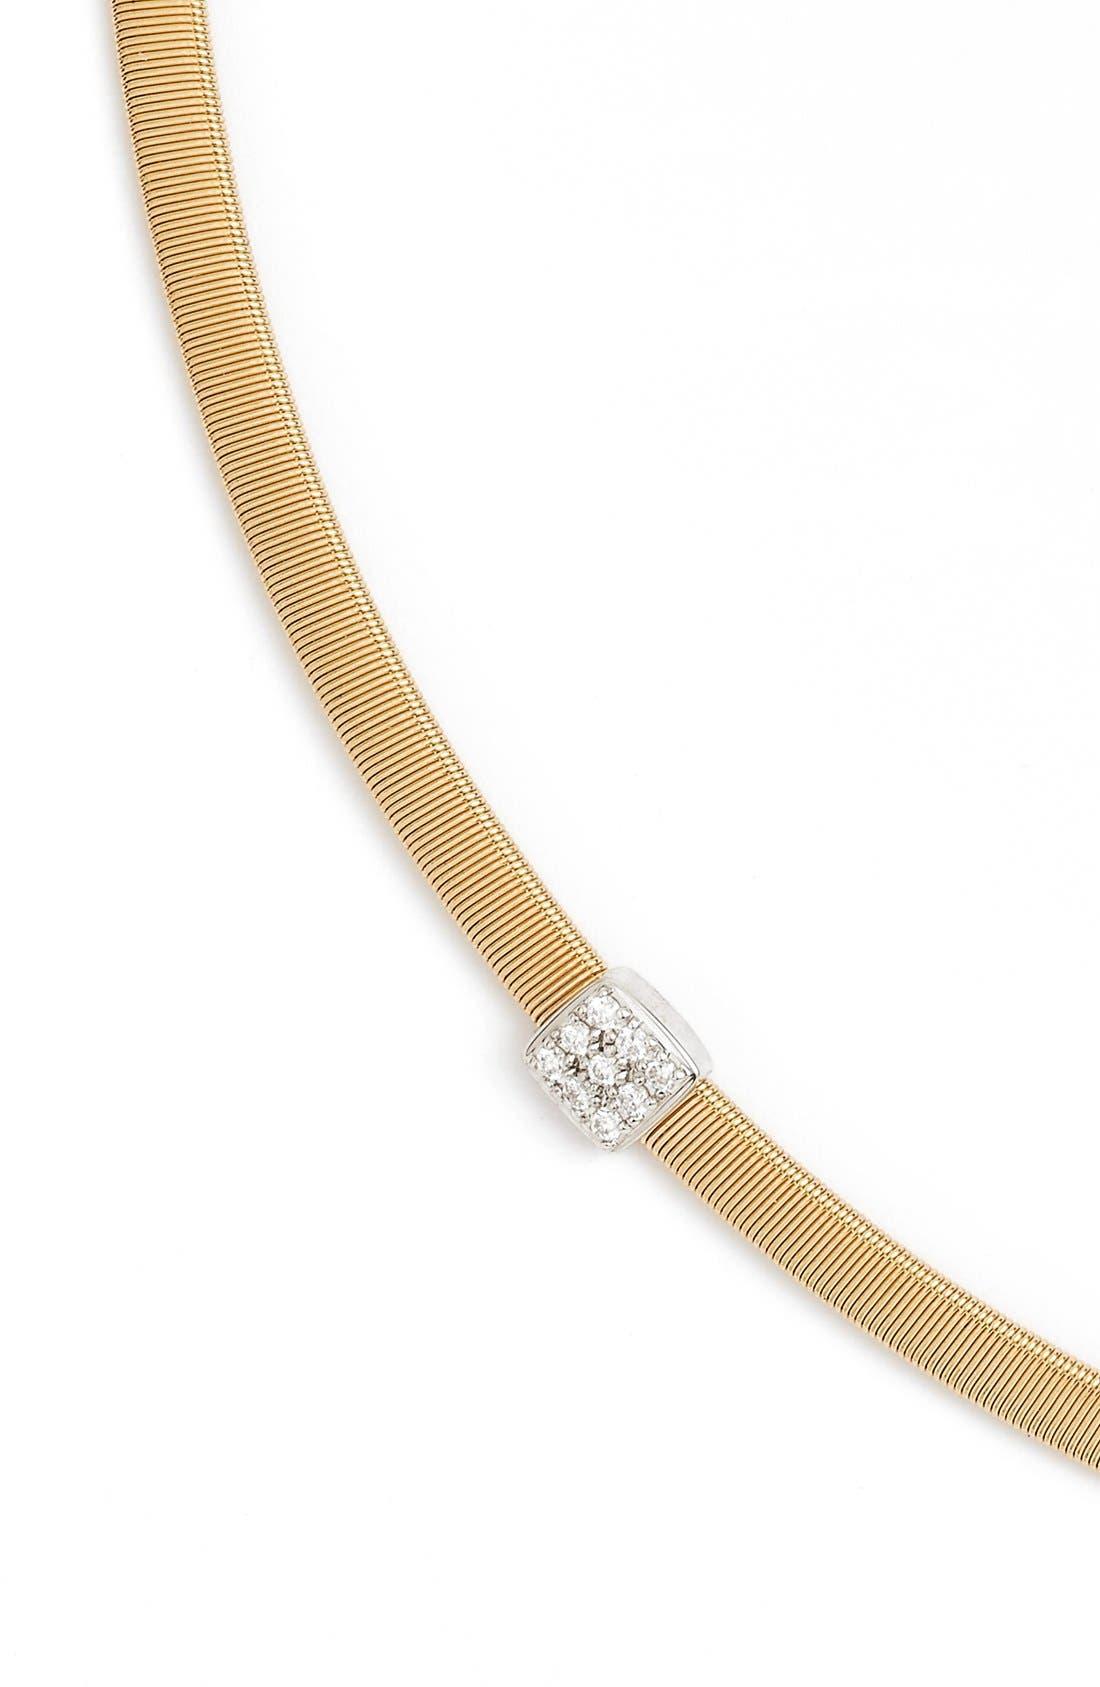 Masai Diamond Collar Necklace,                             Alternate thumbnail 4, color,                             YELLOW GOLD